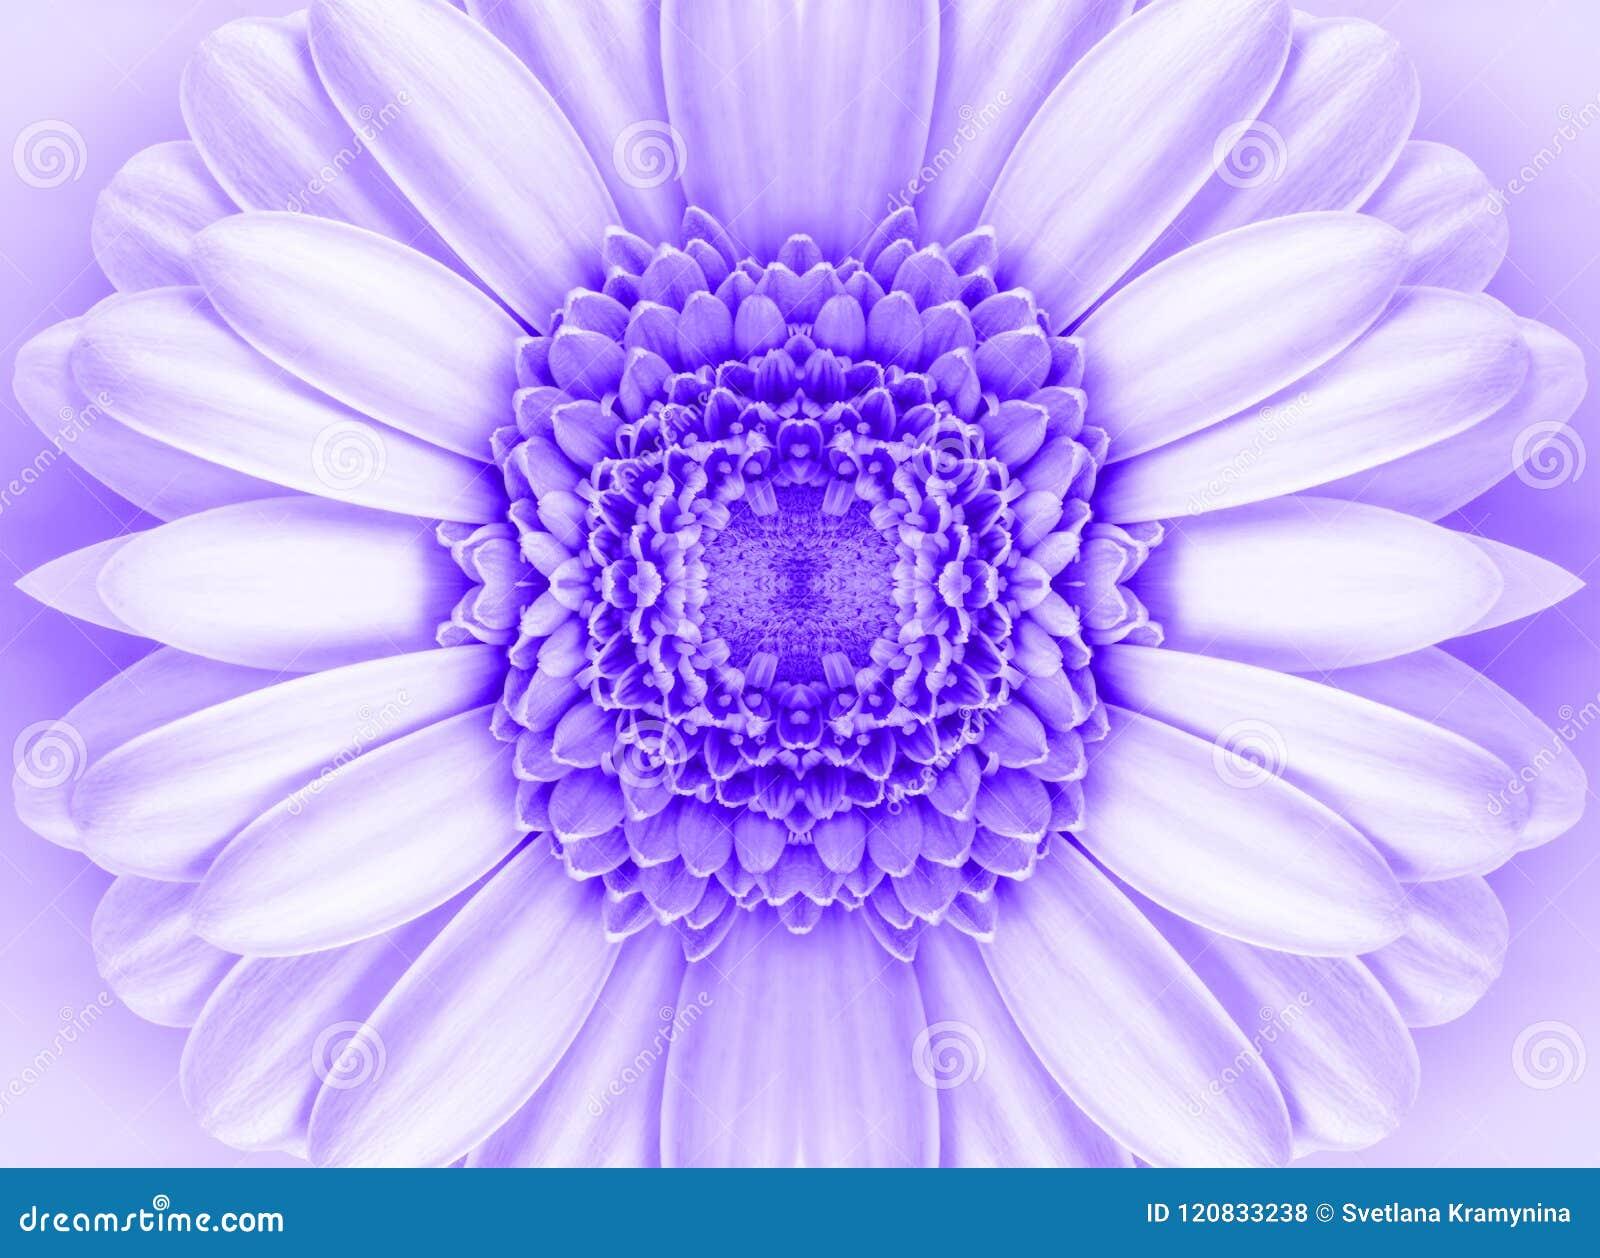 Beautiful Pink Gerbera Flower In Macro Closeup Pastel Color Wallpaper Background Desktop Jpg 1300x1039 Attractive